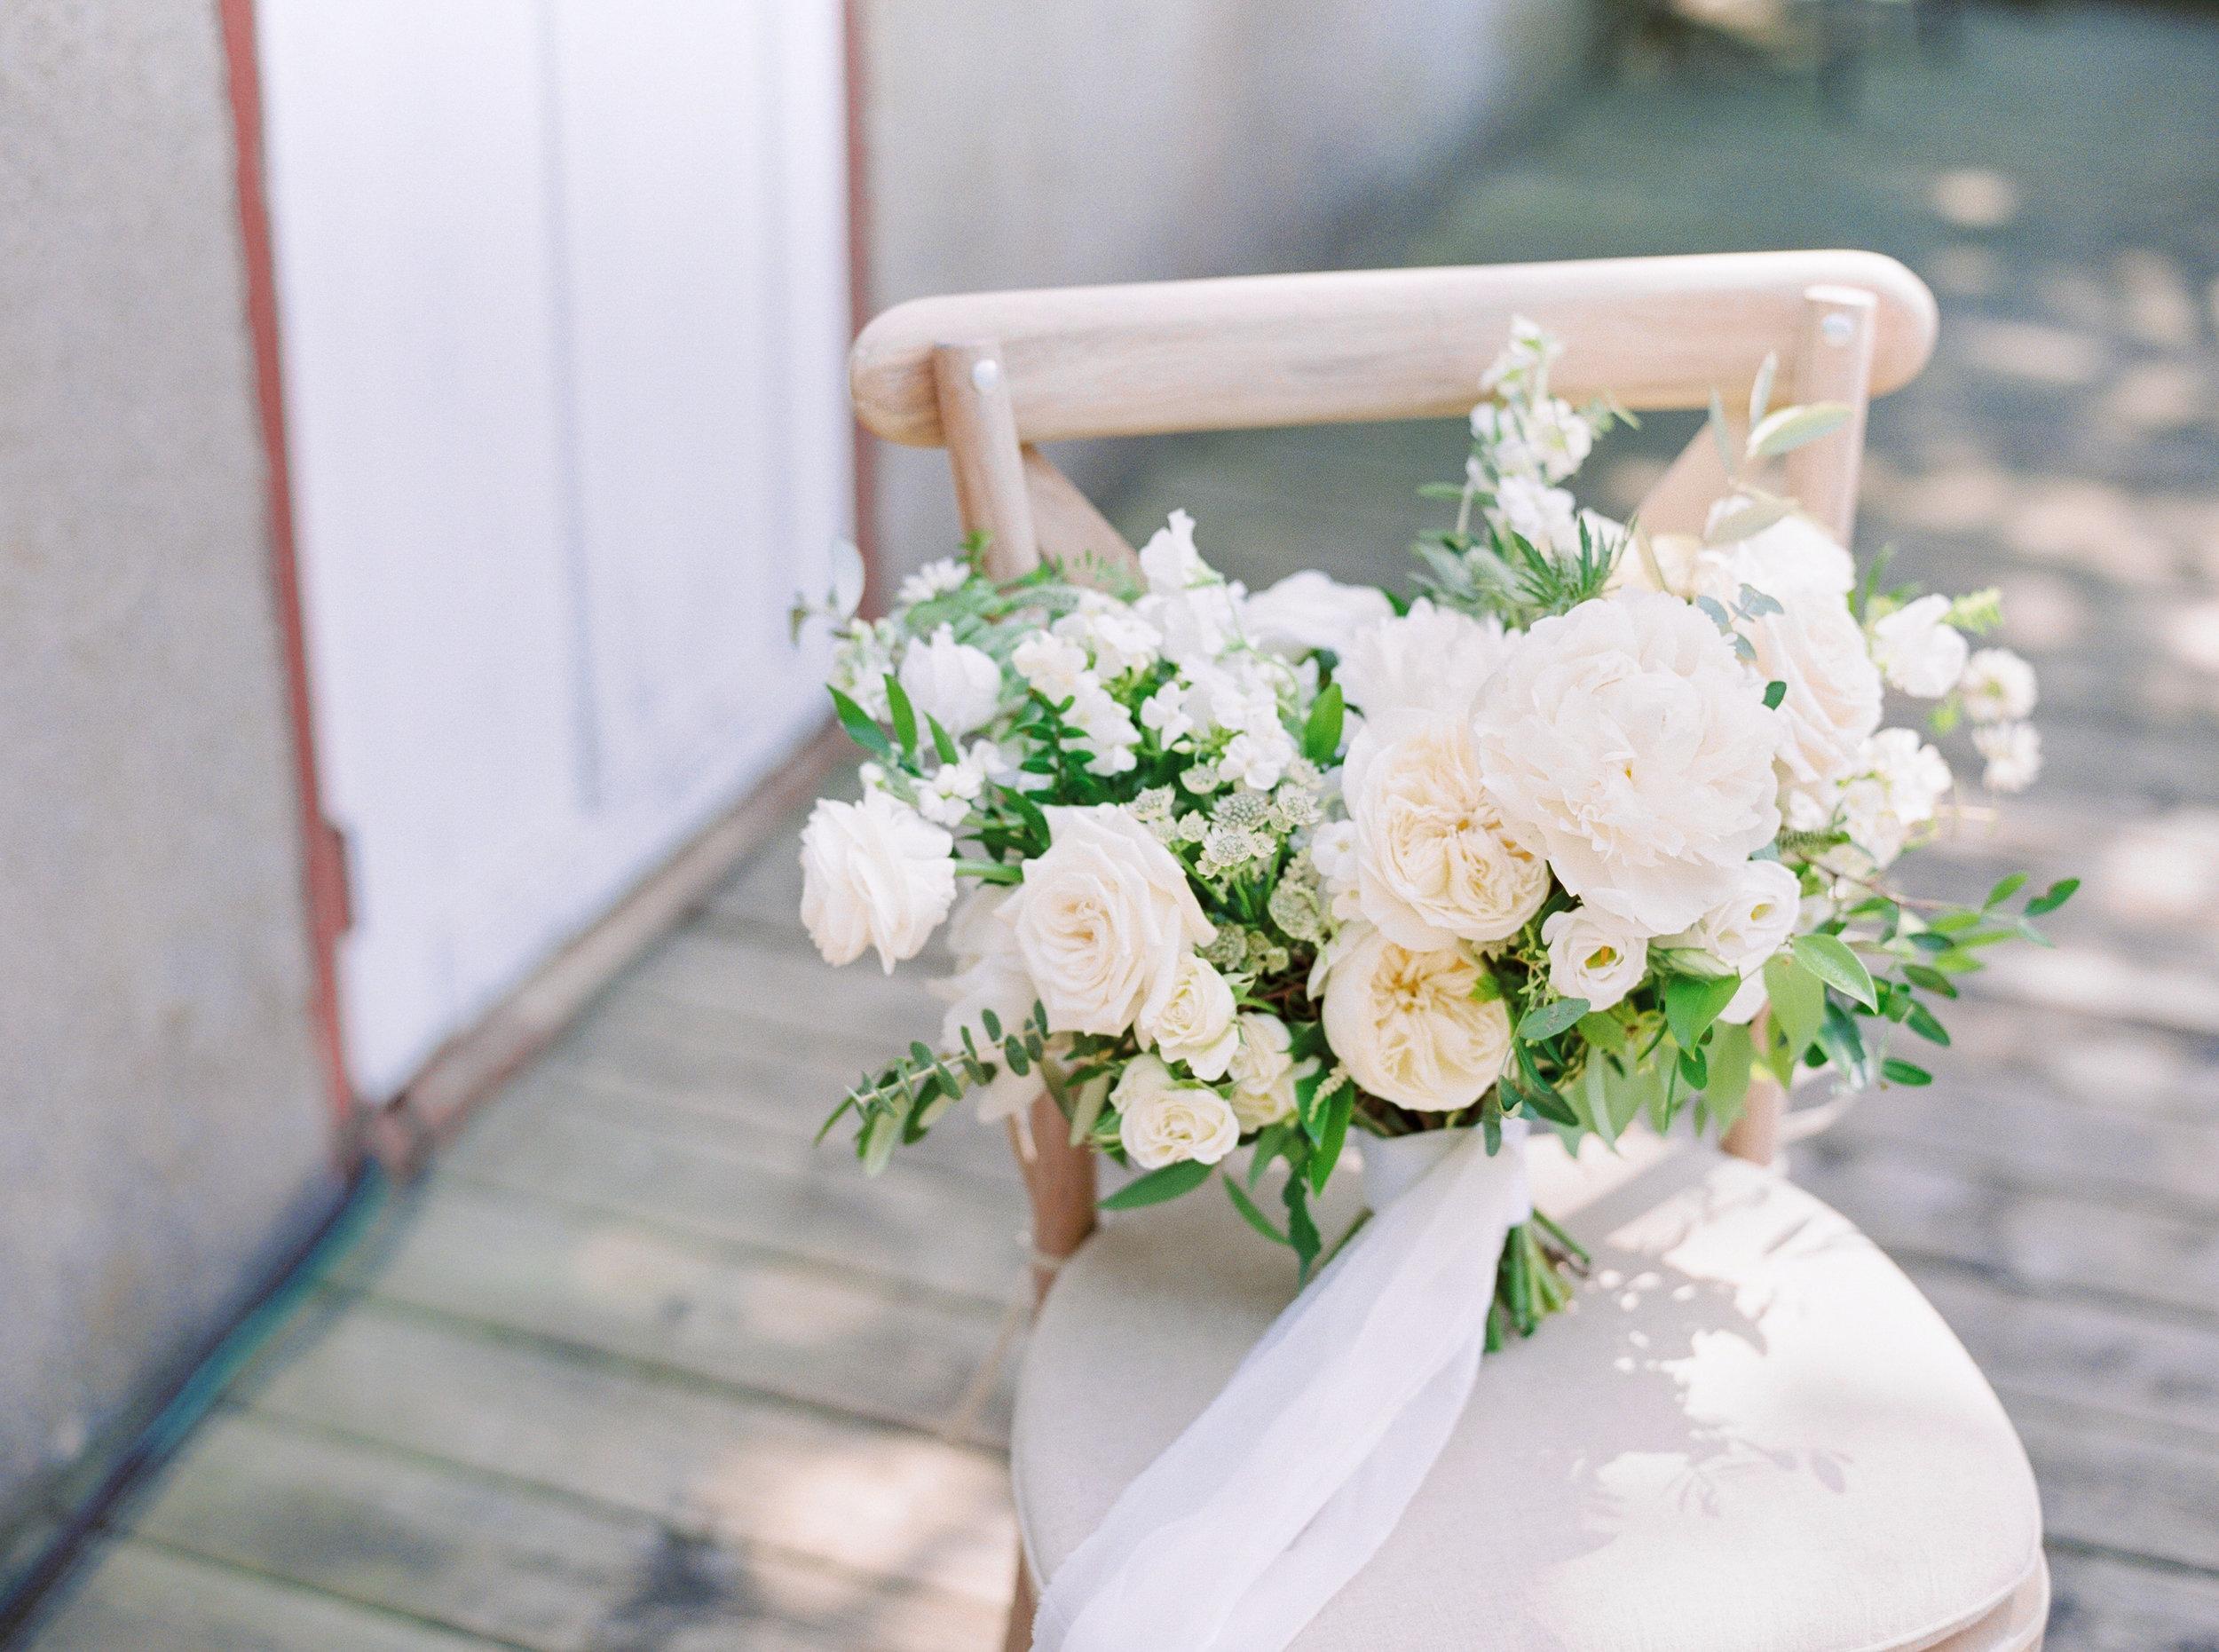 cambium-farms-kurtz-wedding-toronto-photographer-langdon-film-richelle-hunter-cori-joey-previews-18.jpg